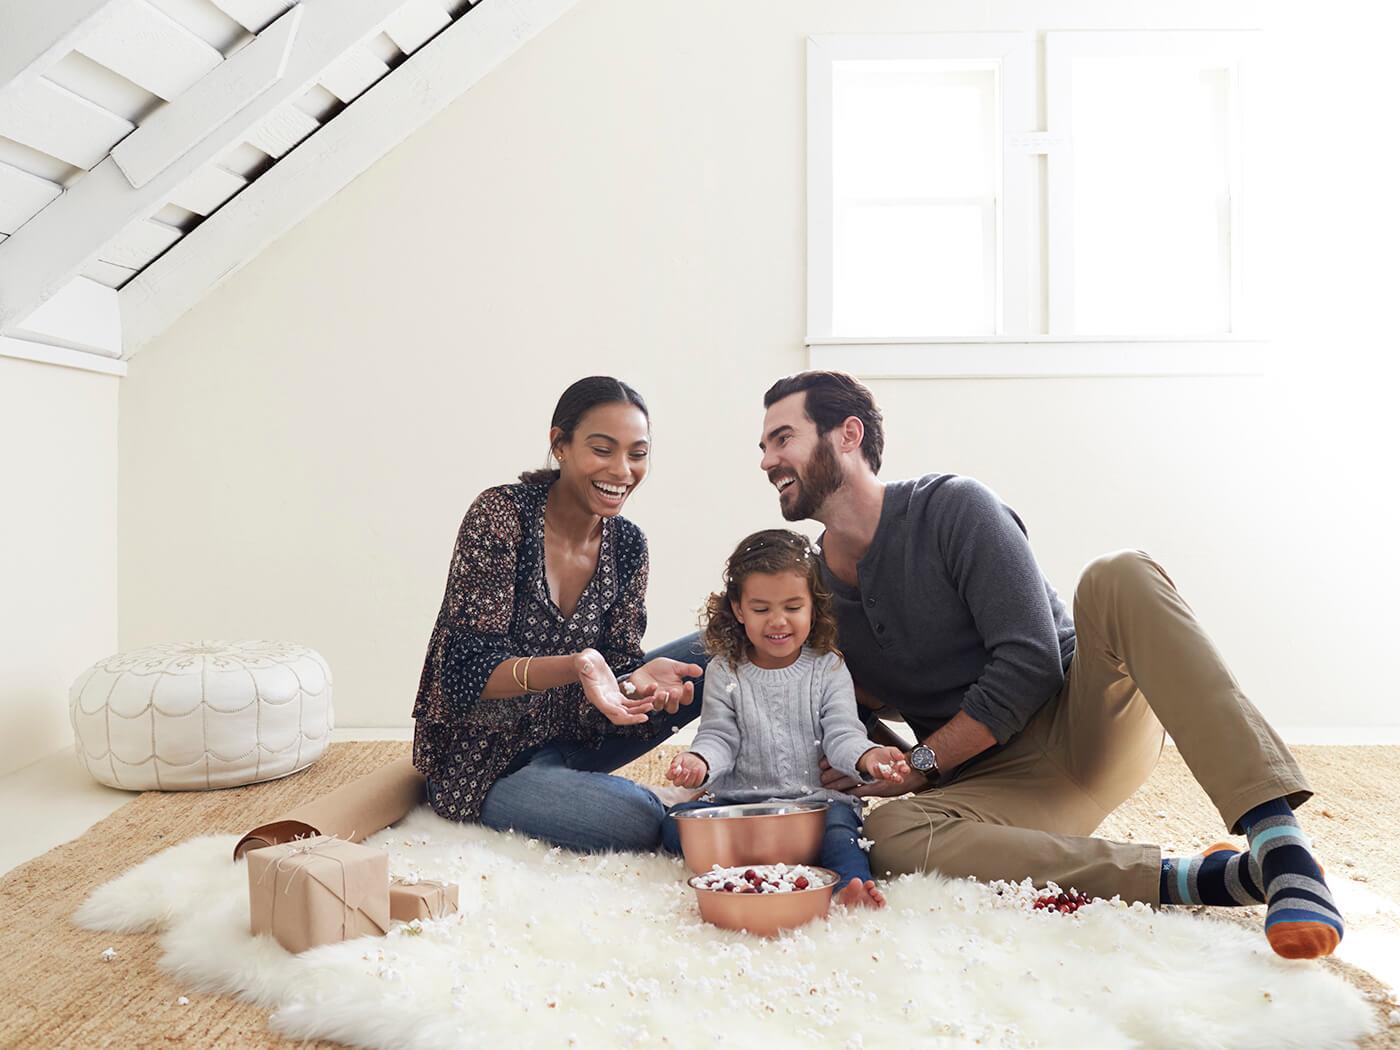 How to Take Family Photo